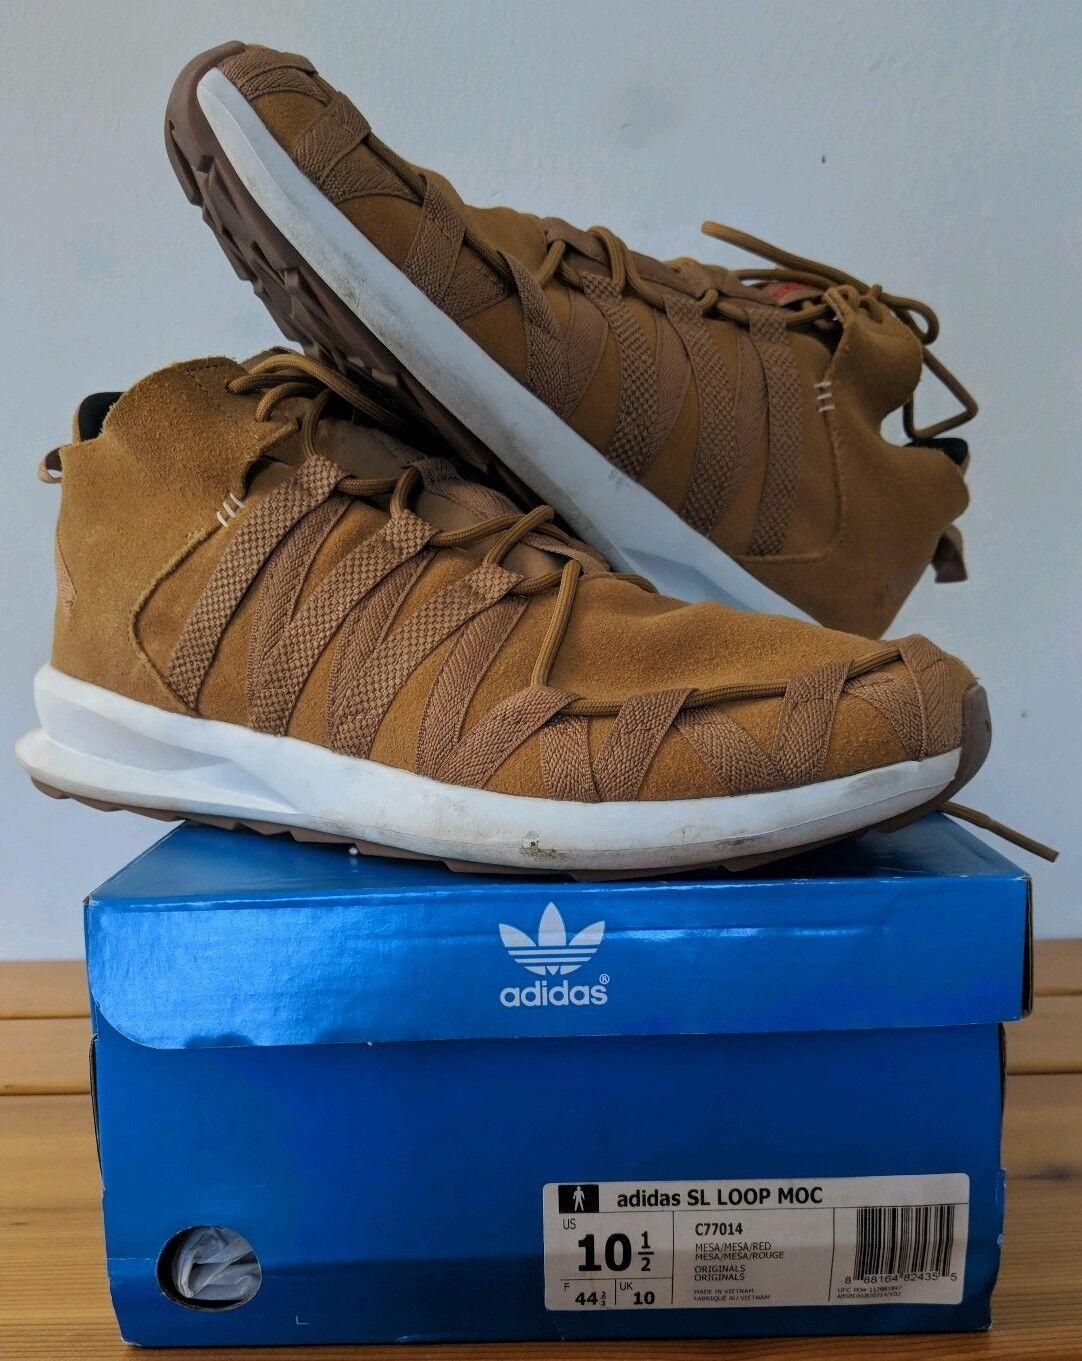 Mens Adidas 10.5 SL LOOP MOC Size 10.5 Adidas (C77014) aceb03